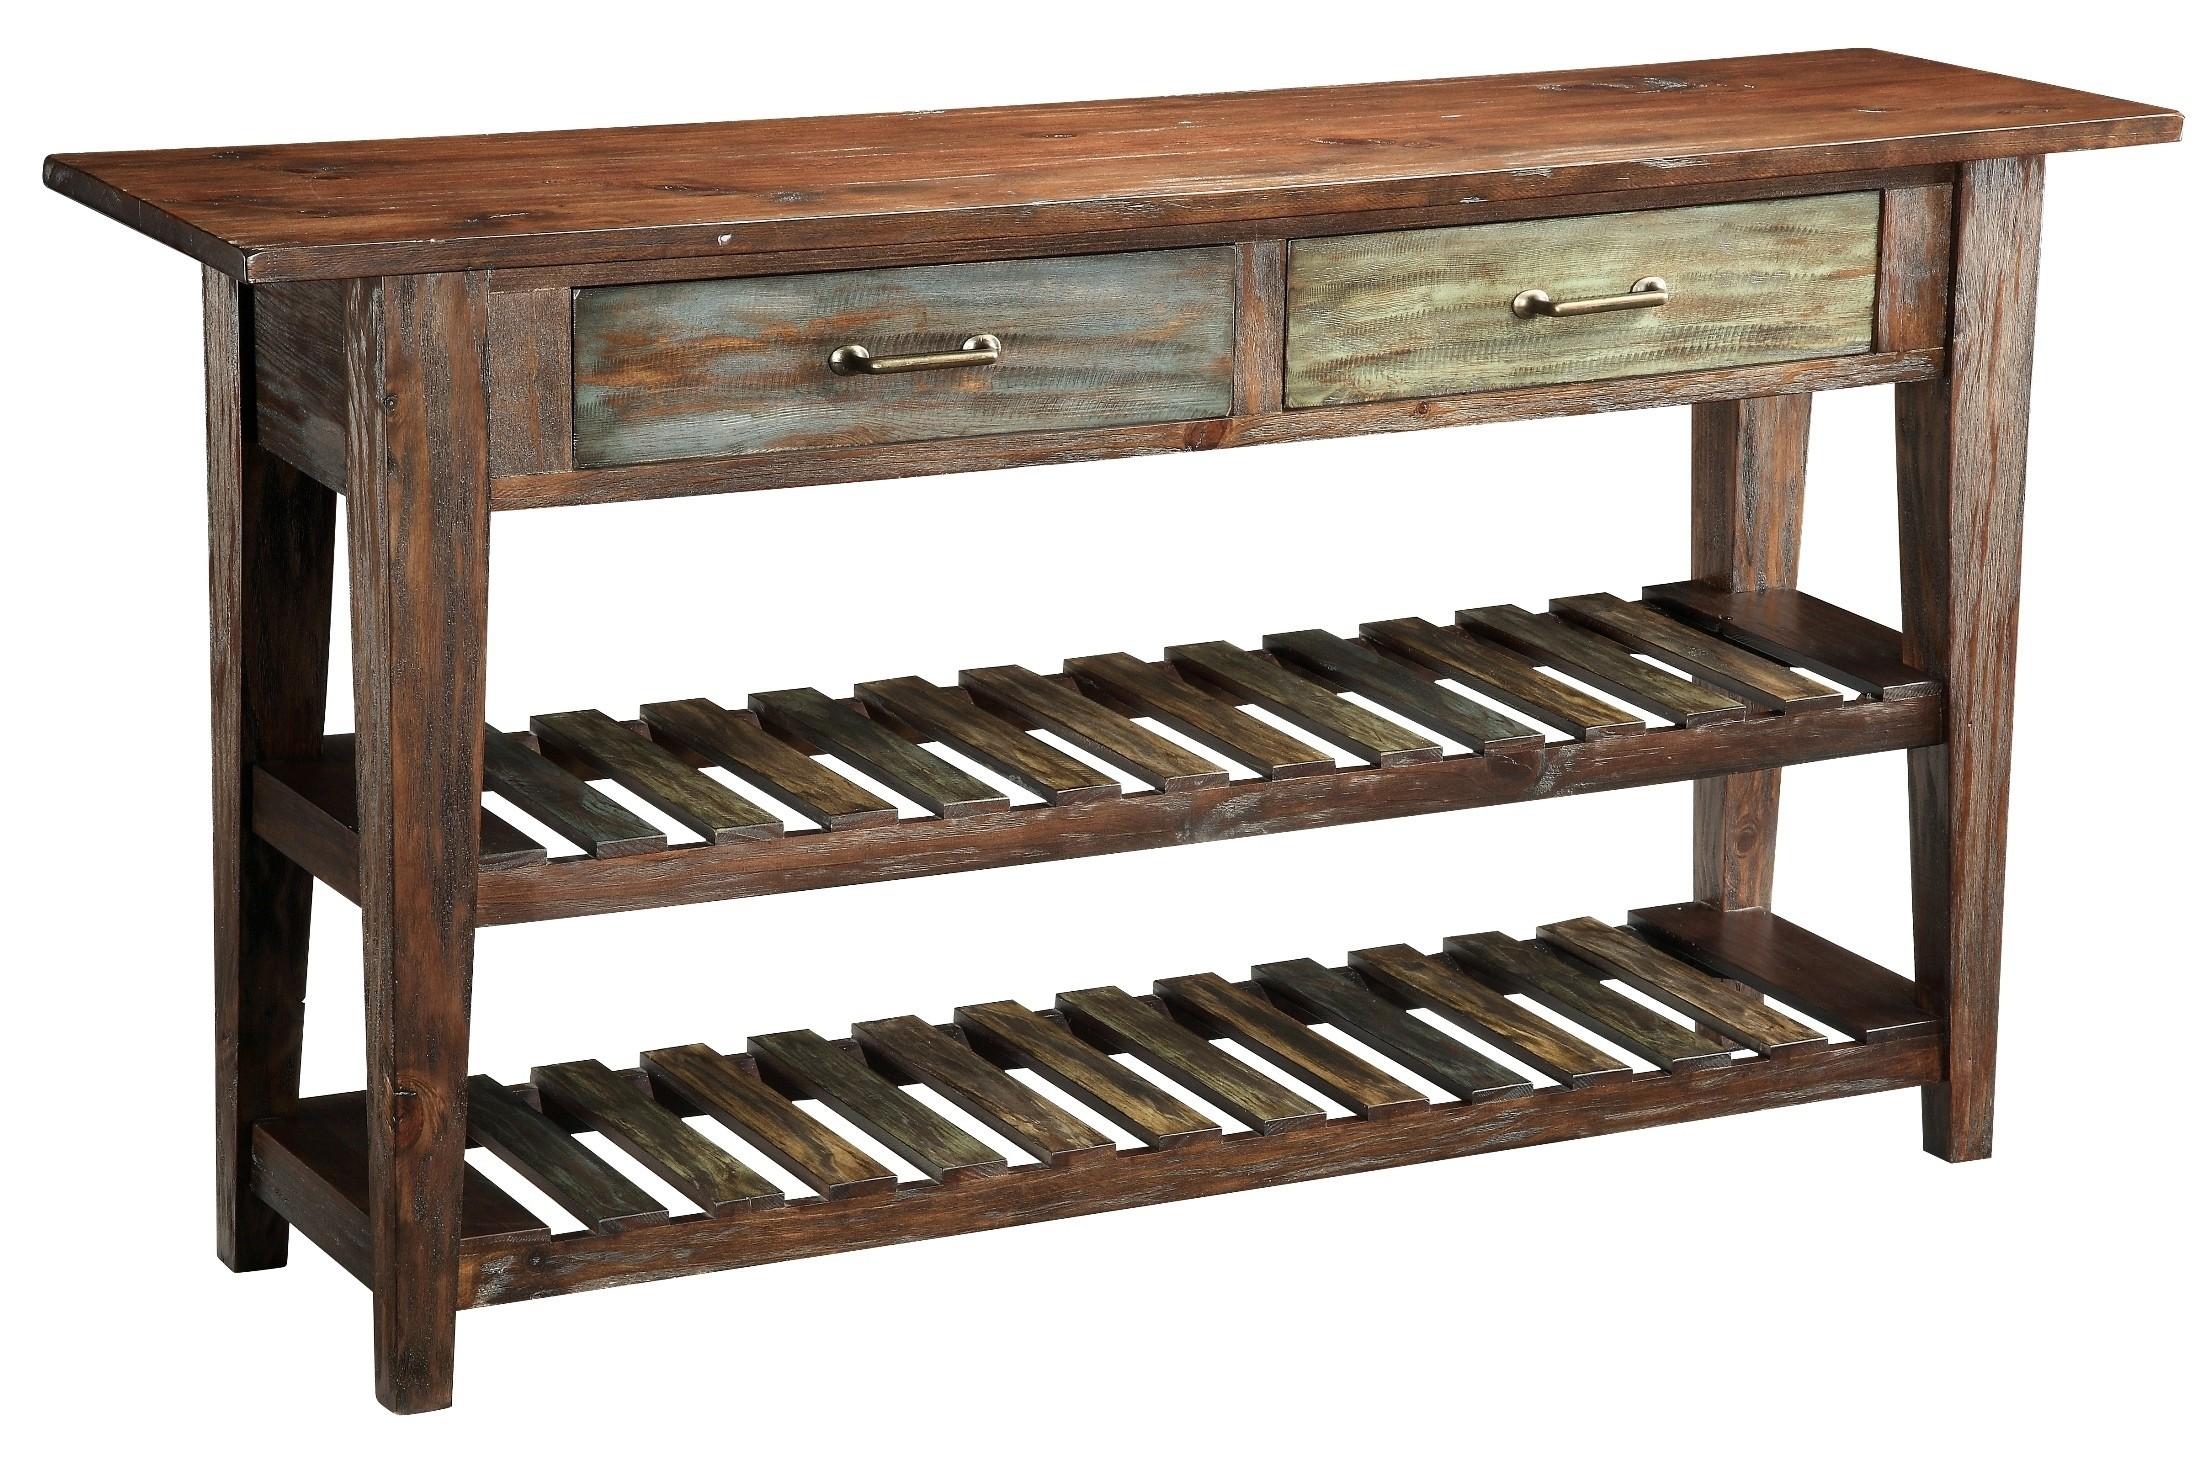 sofa table with wine rack foter rh foter com Wine Console Table with Storage black sofa table with wine rack